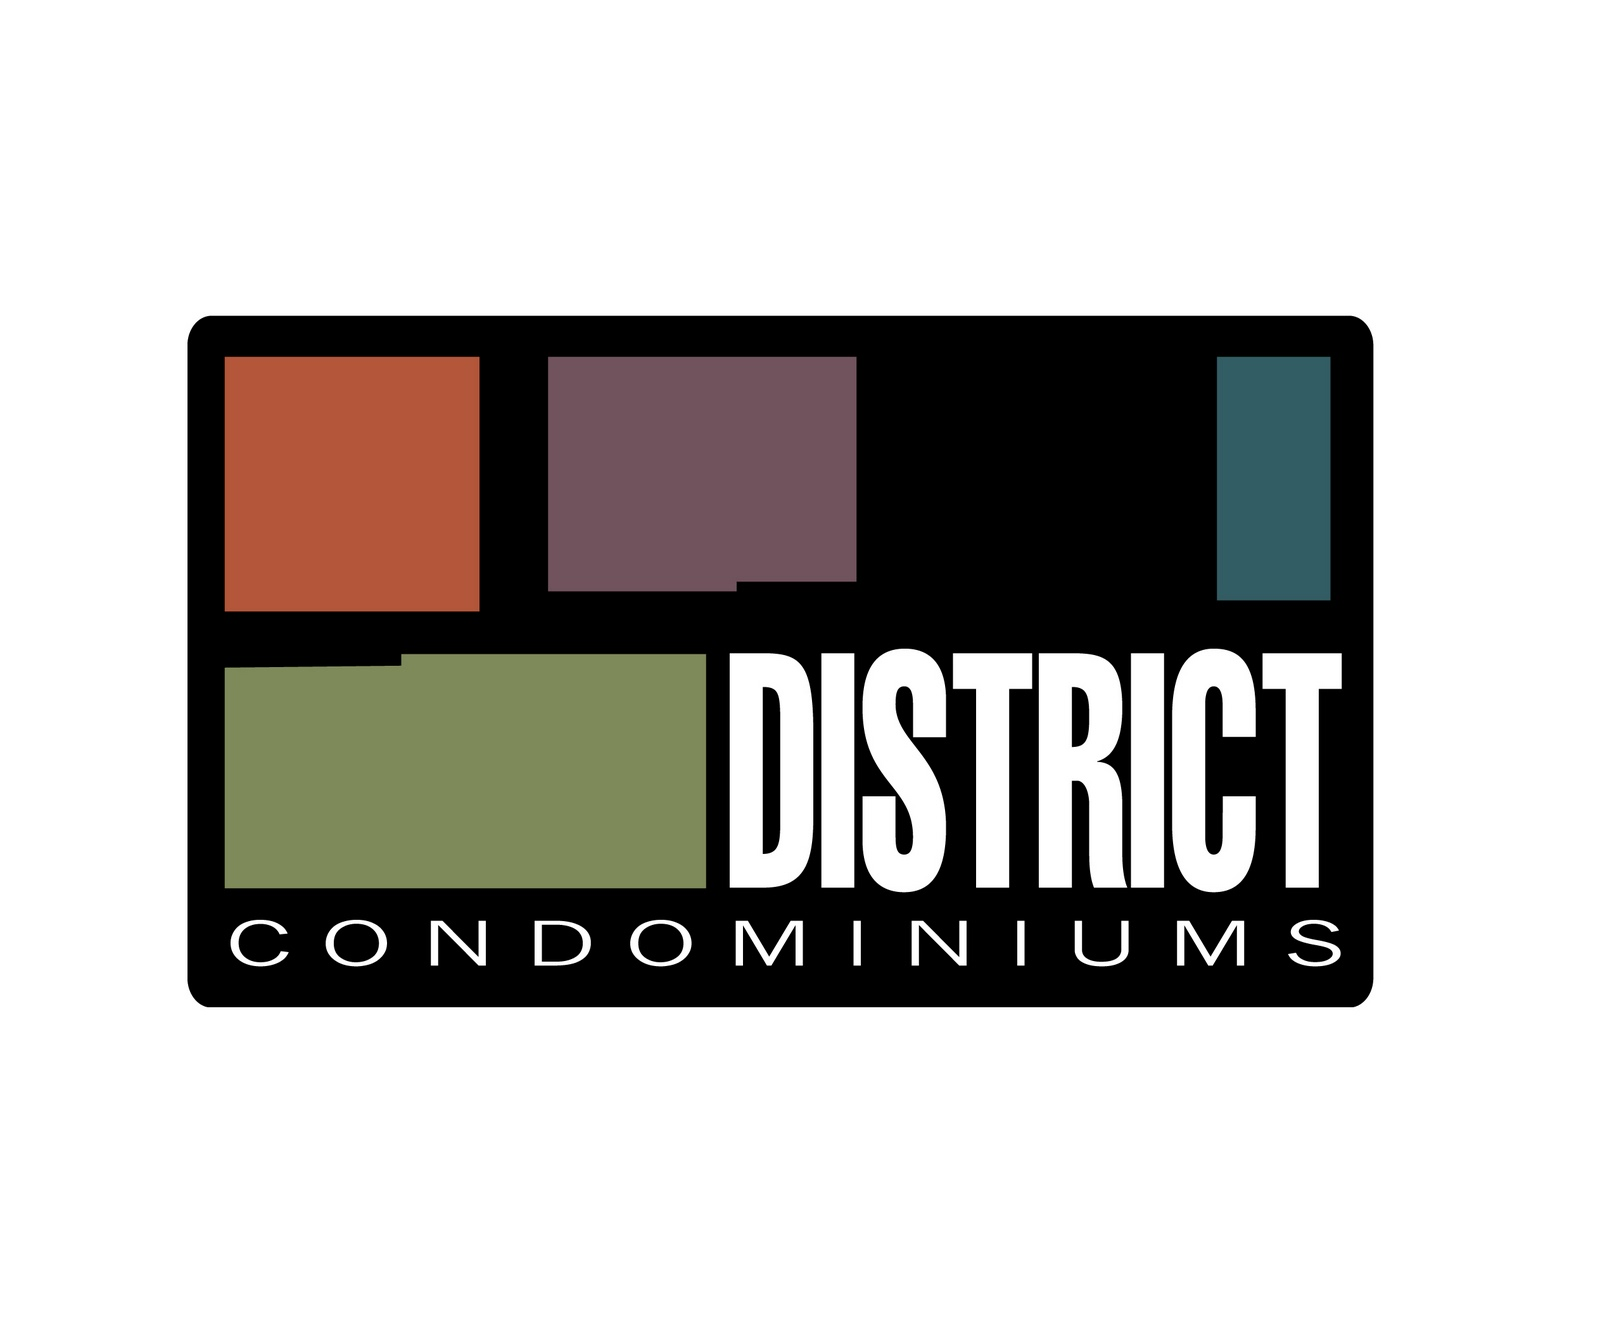 wolf communications district condominiums logo